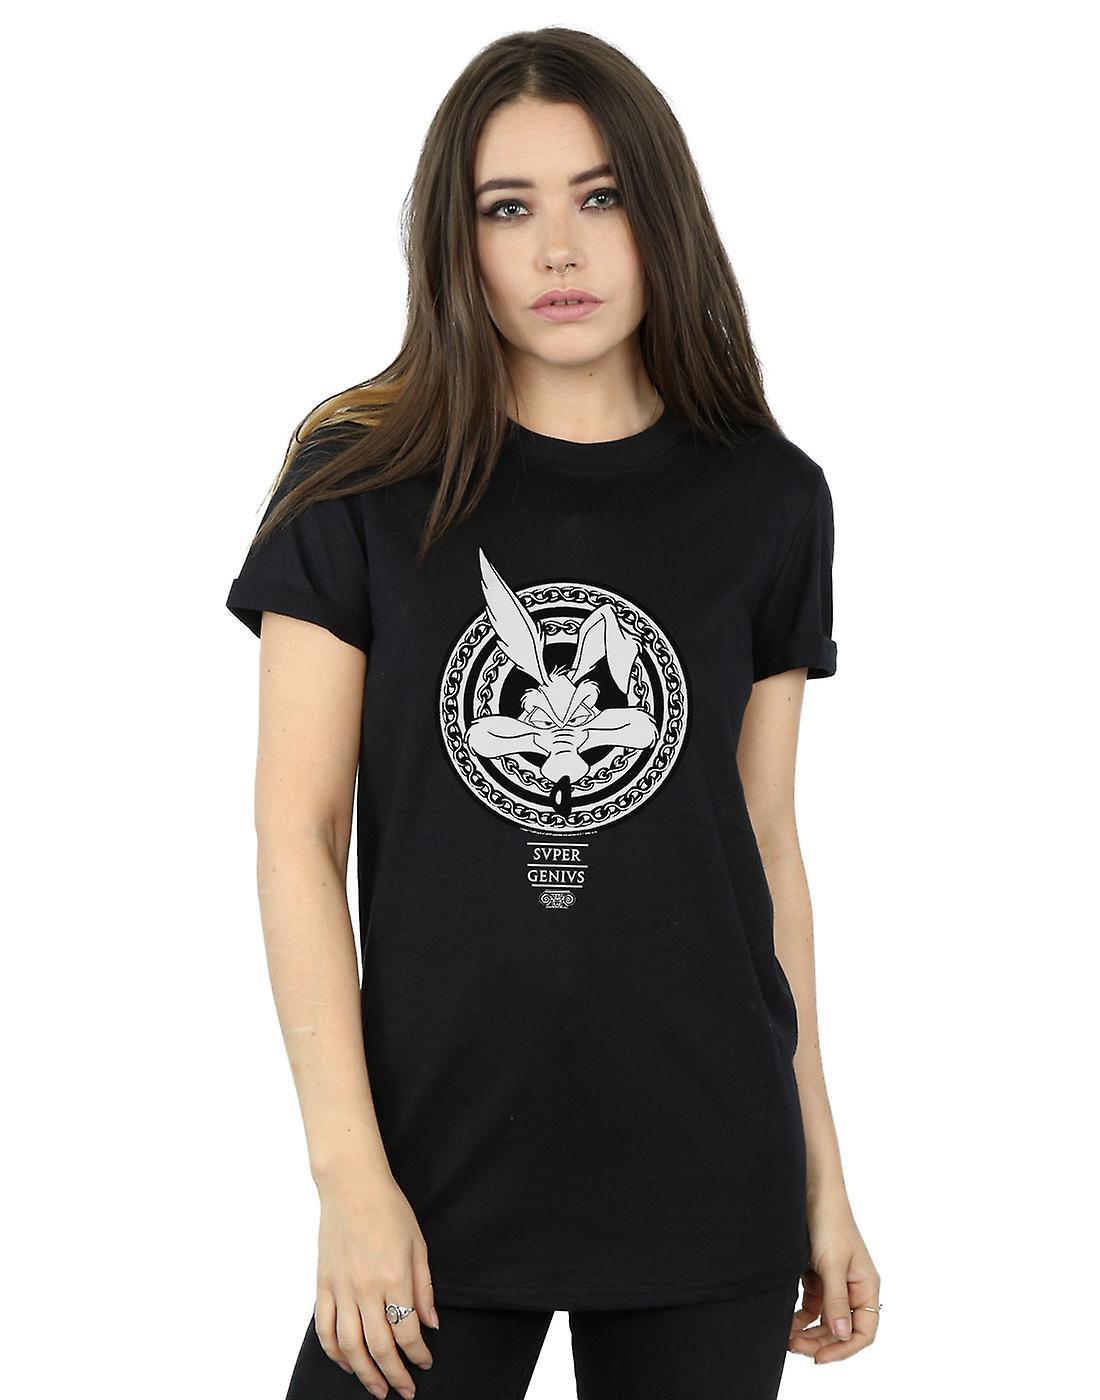 Looney Tunes Women's Wile E Coyote Super Genius Boyfriend Fit T-Shirt